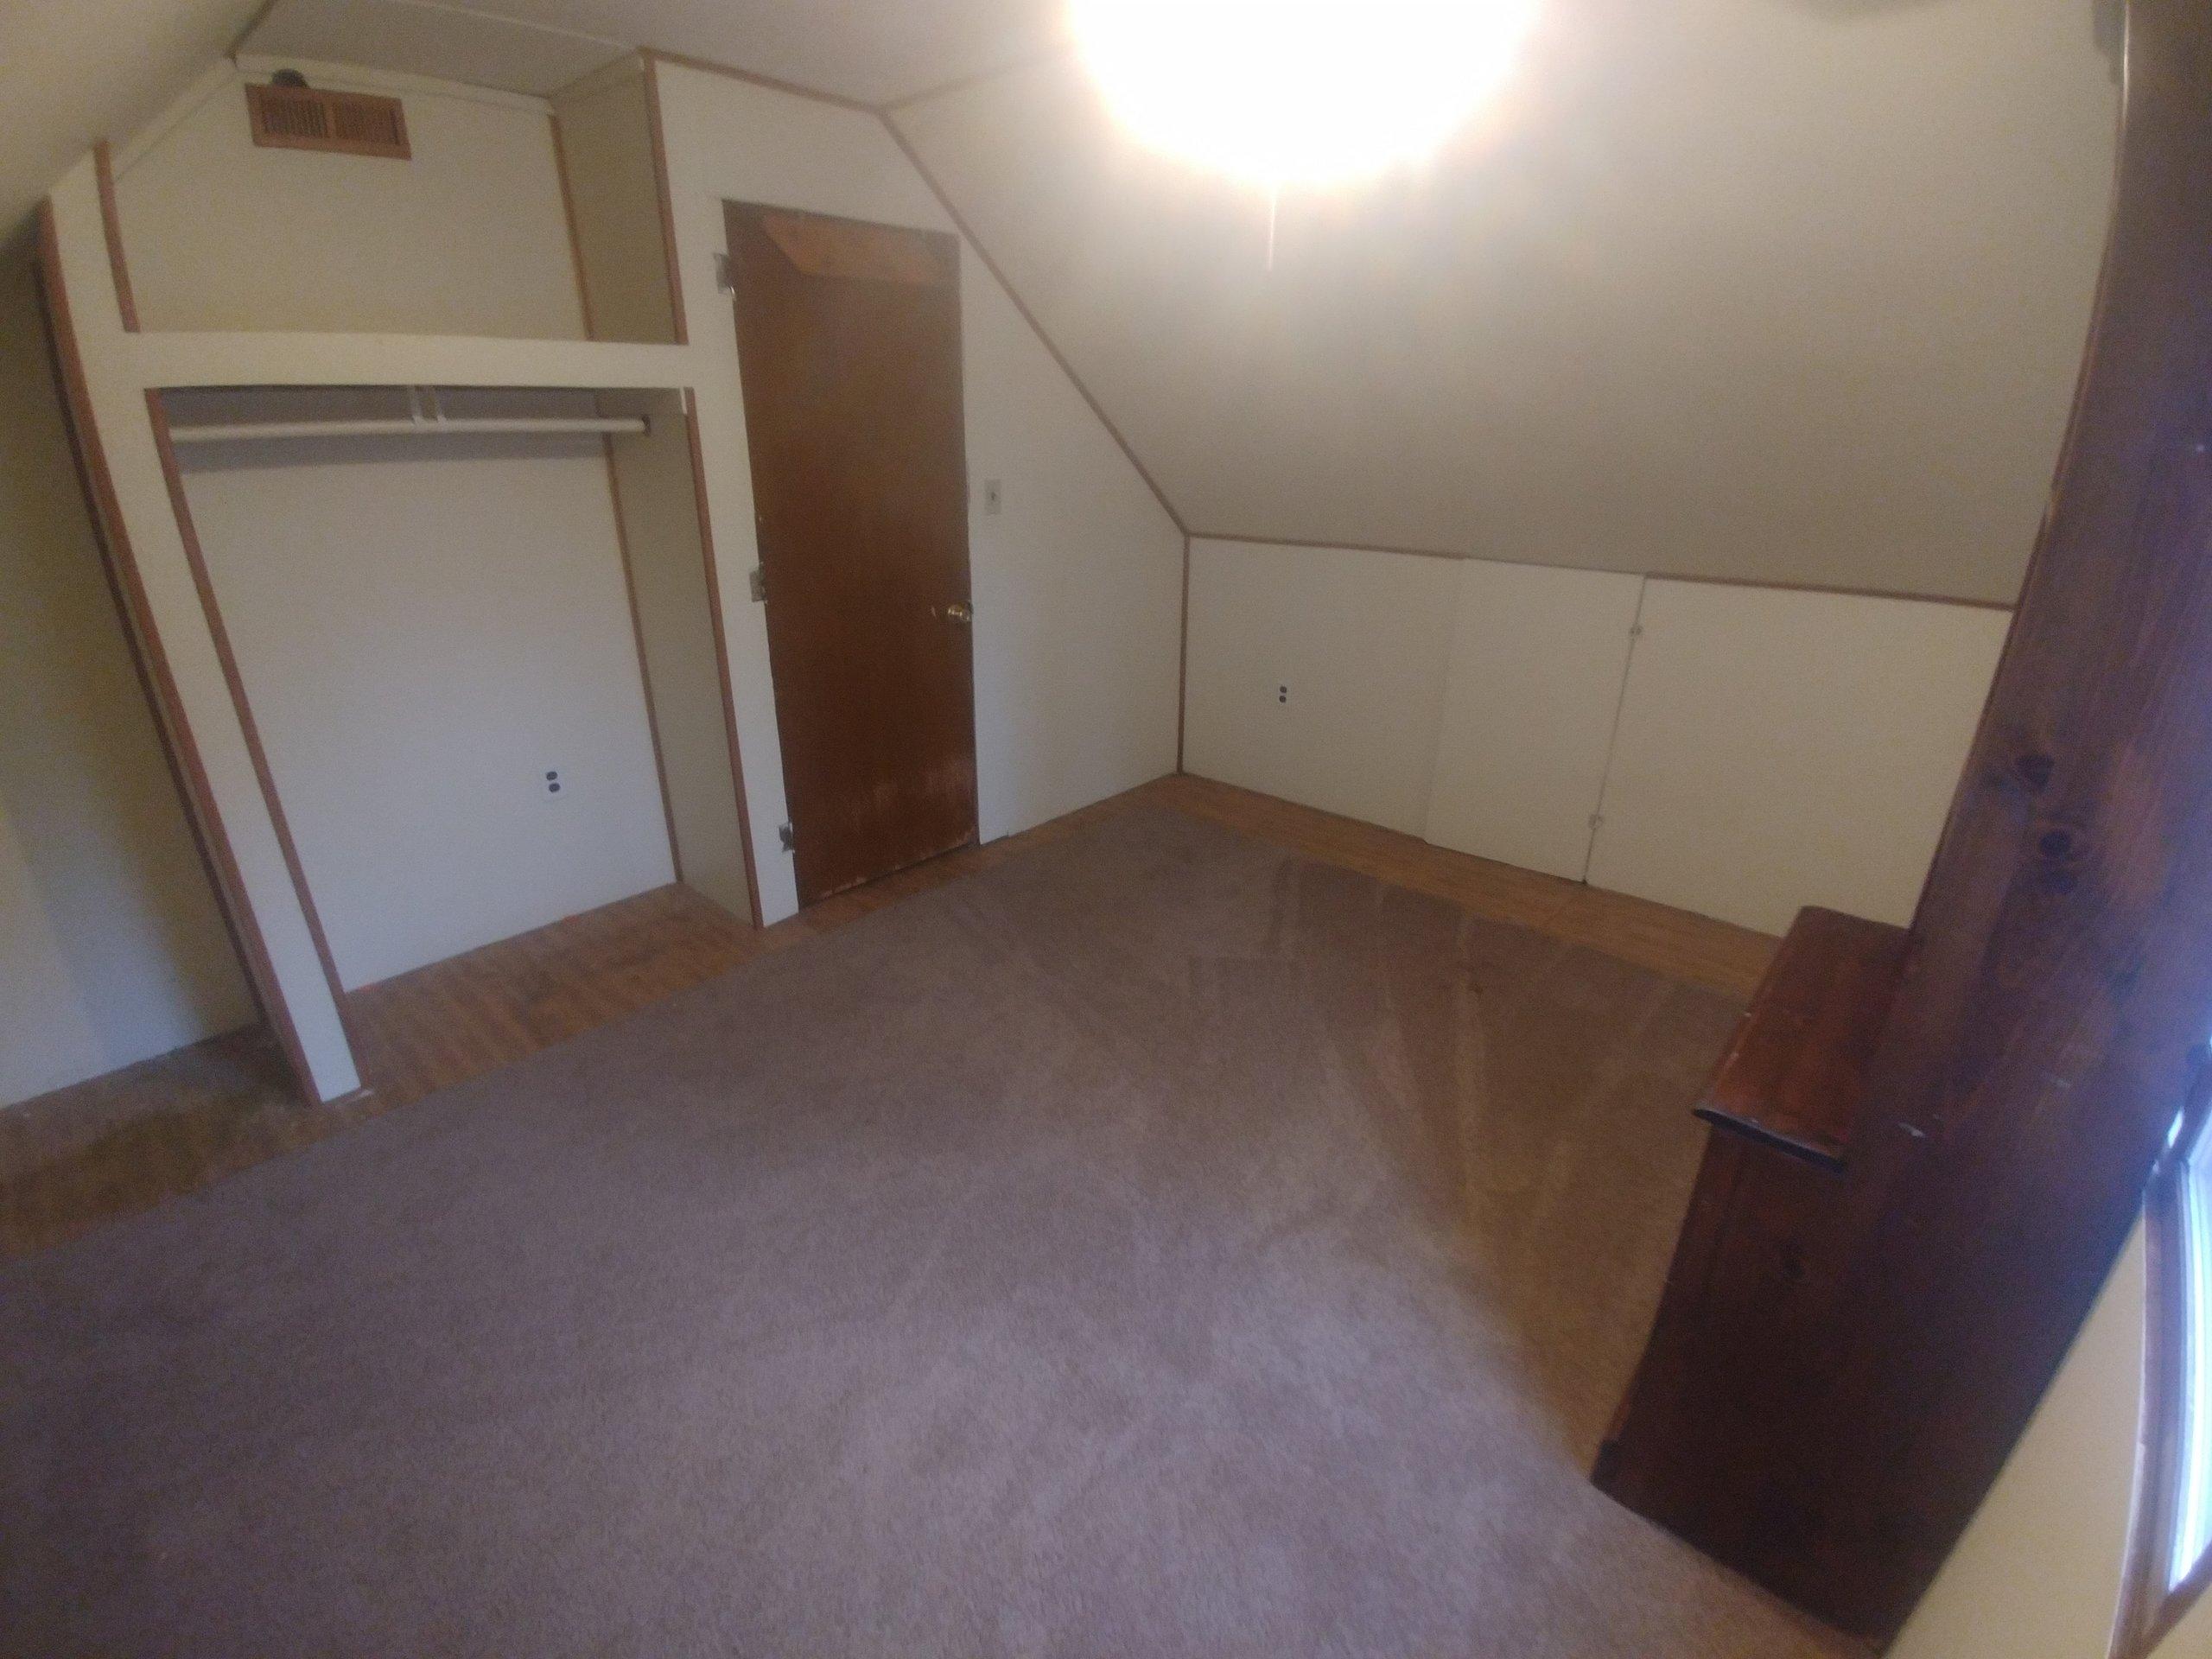 10x14 Bedroom self storage unit